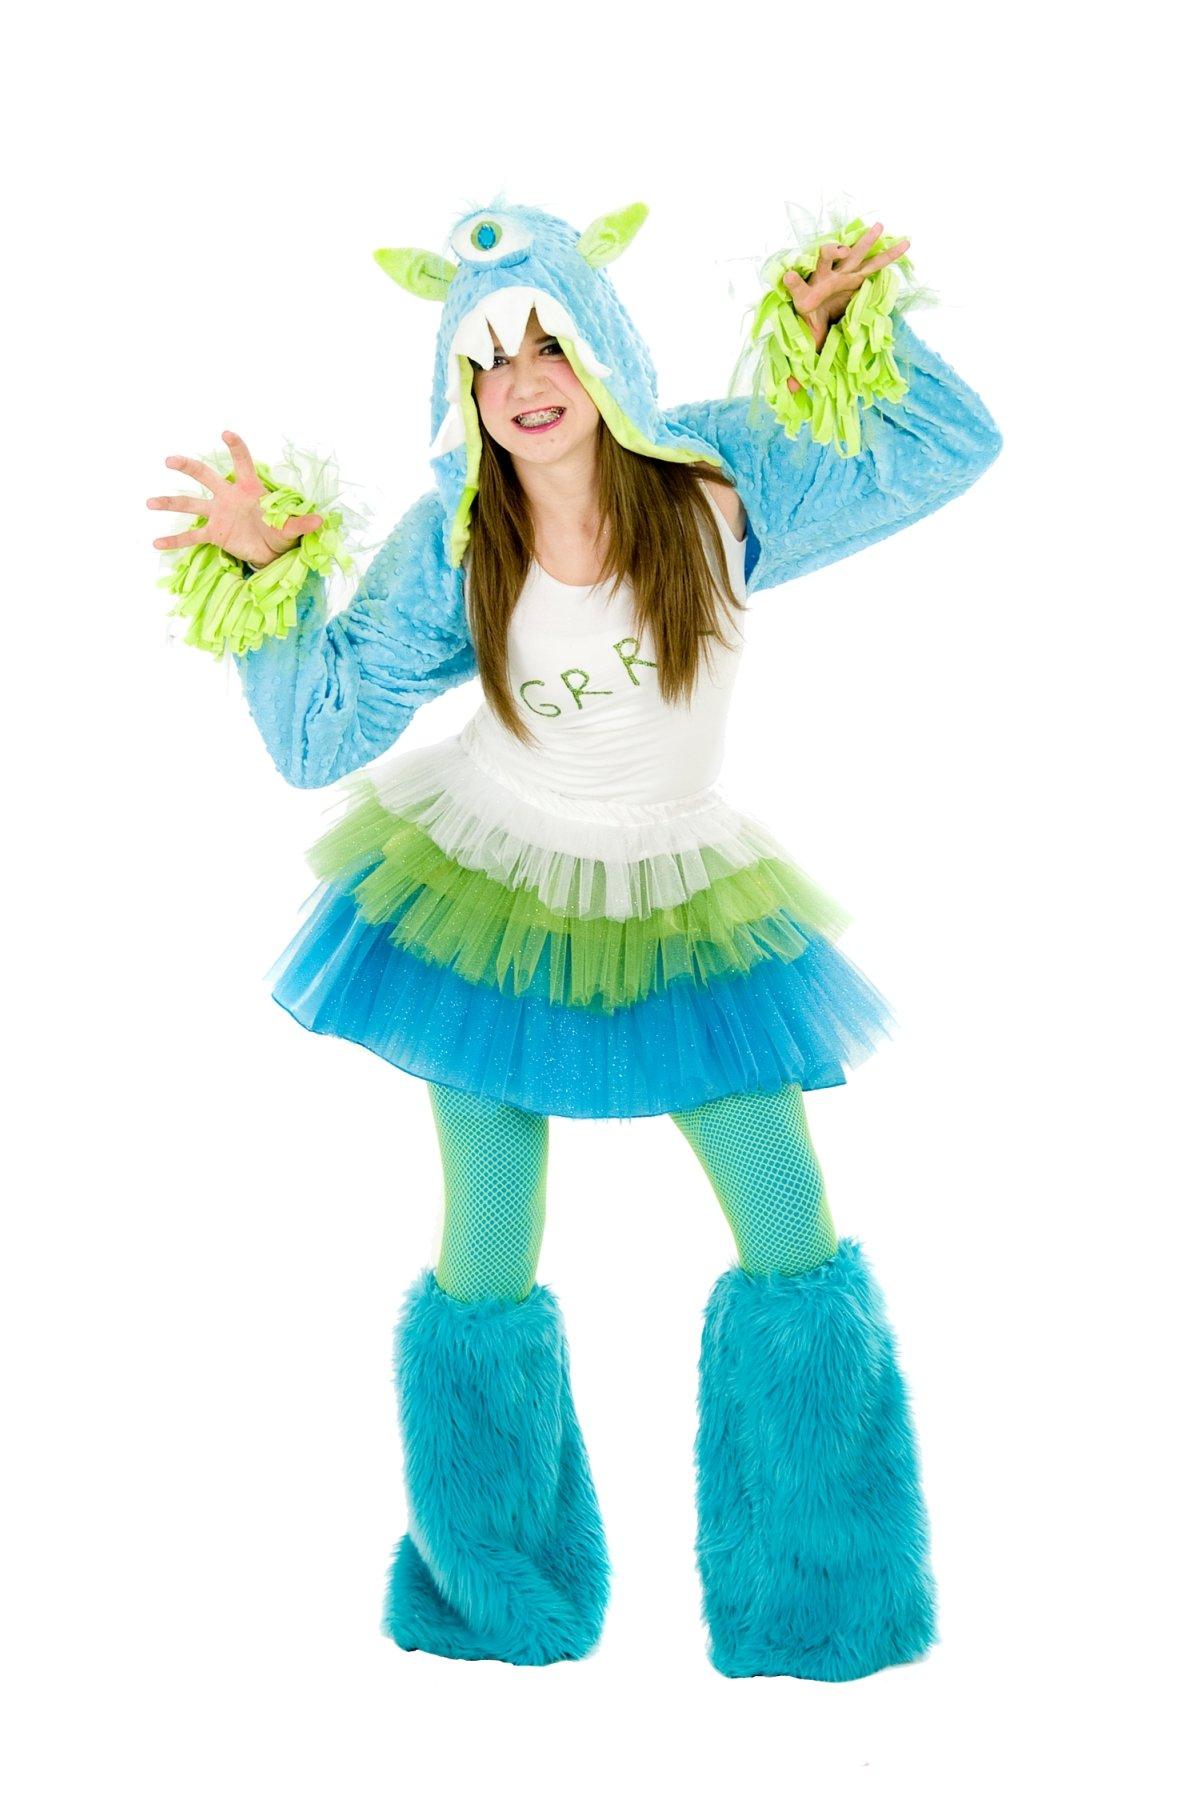 Princess Paradise Tween GRR Monster Costume Set, Multicolor, One Size by Princess Paradise